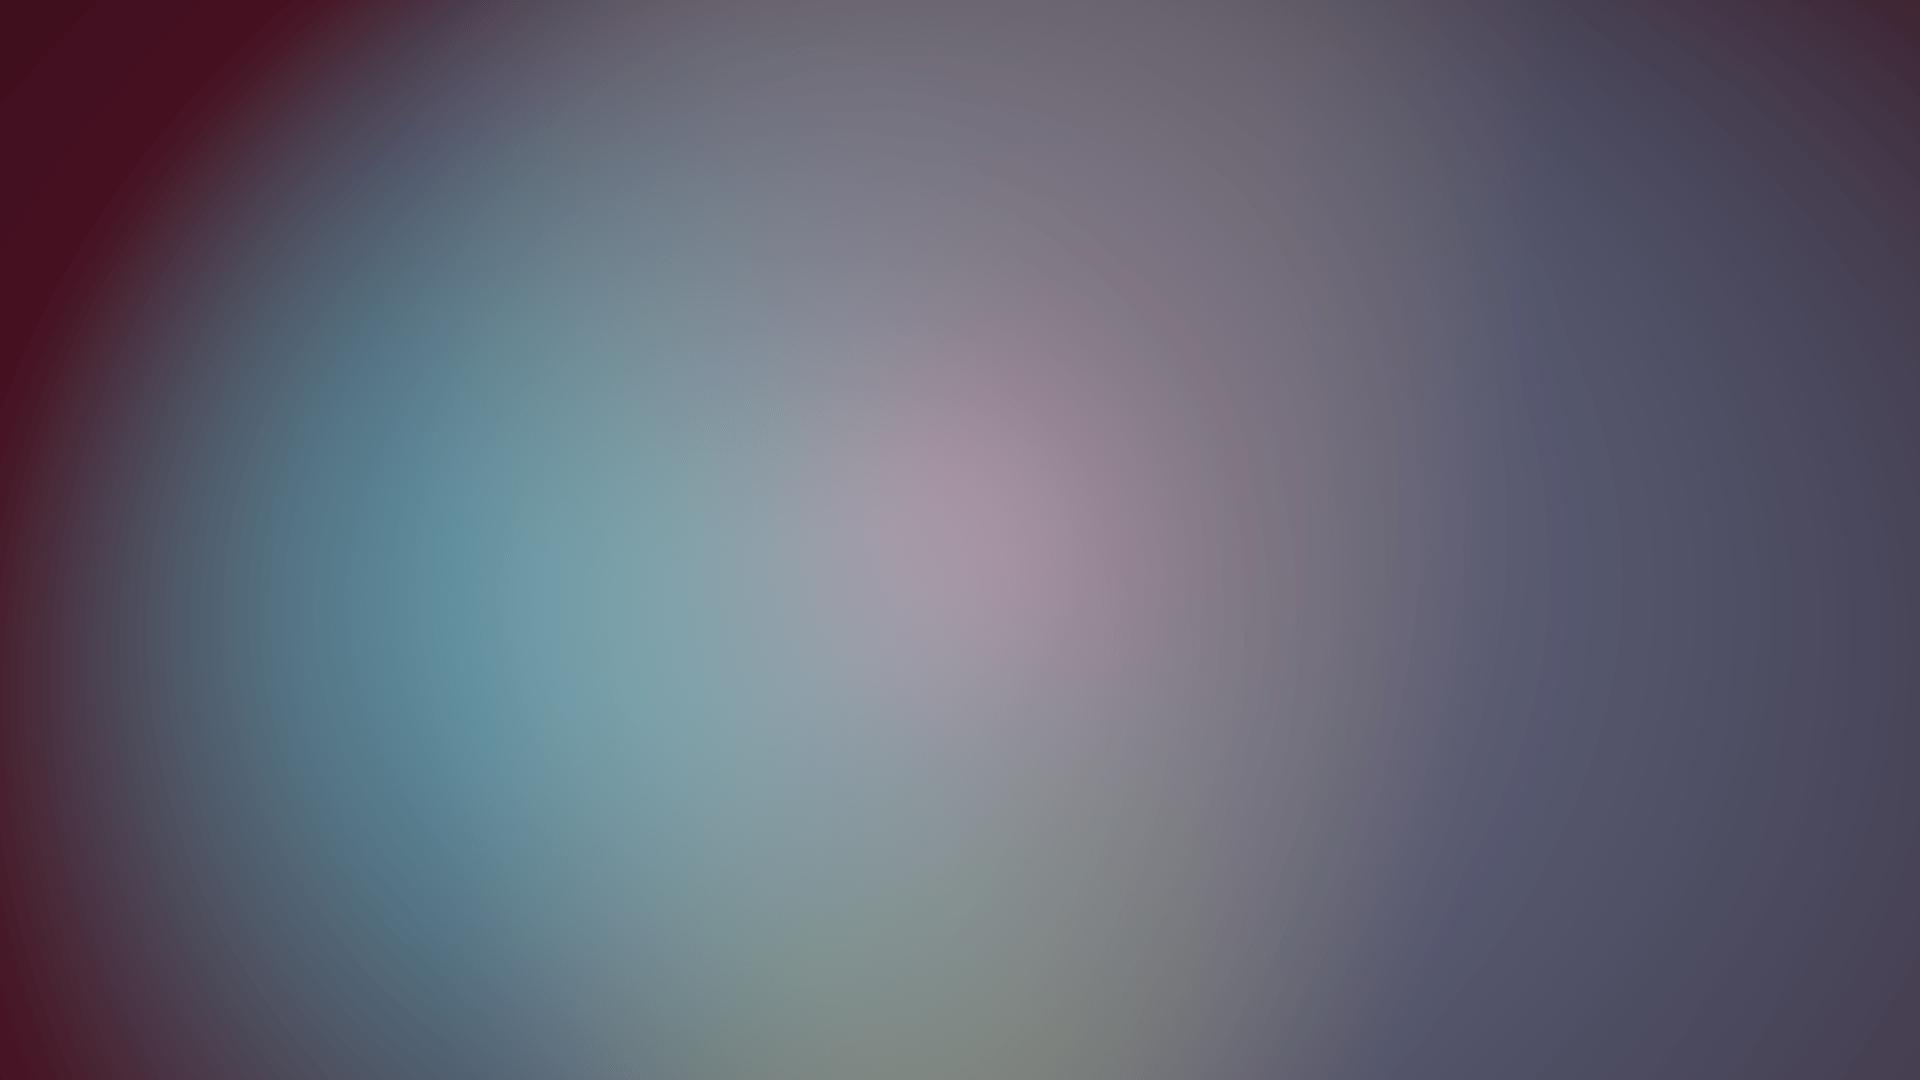 HD Plain Backgrounds - Wallpaper Cave